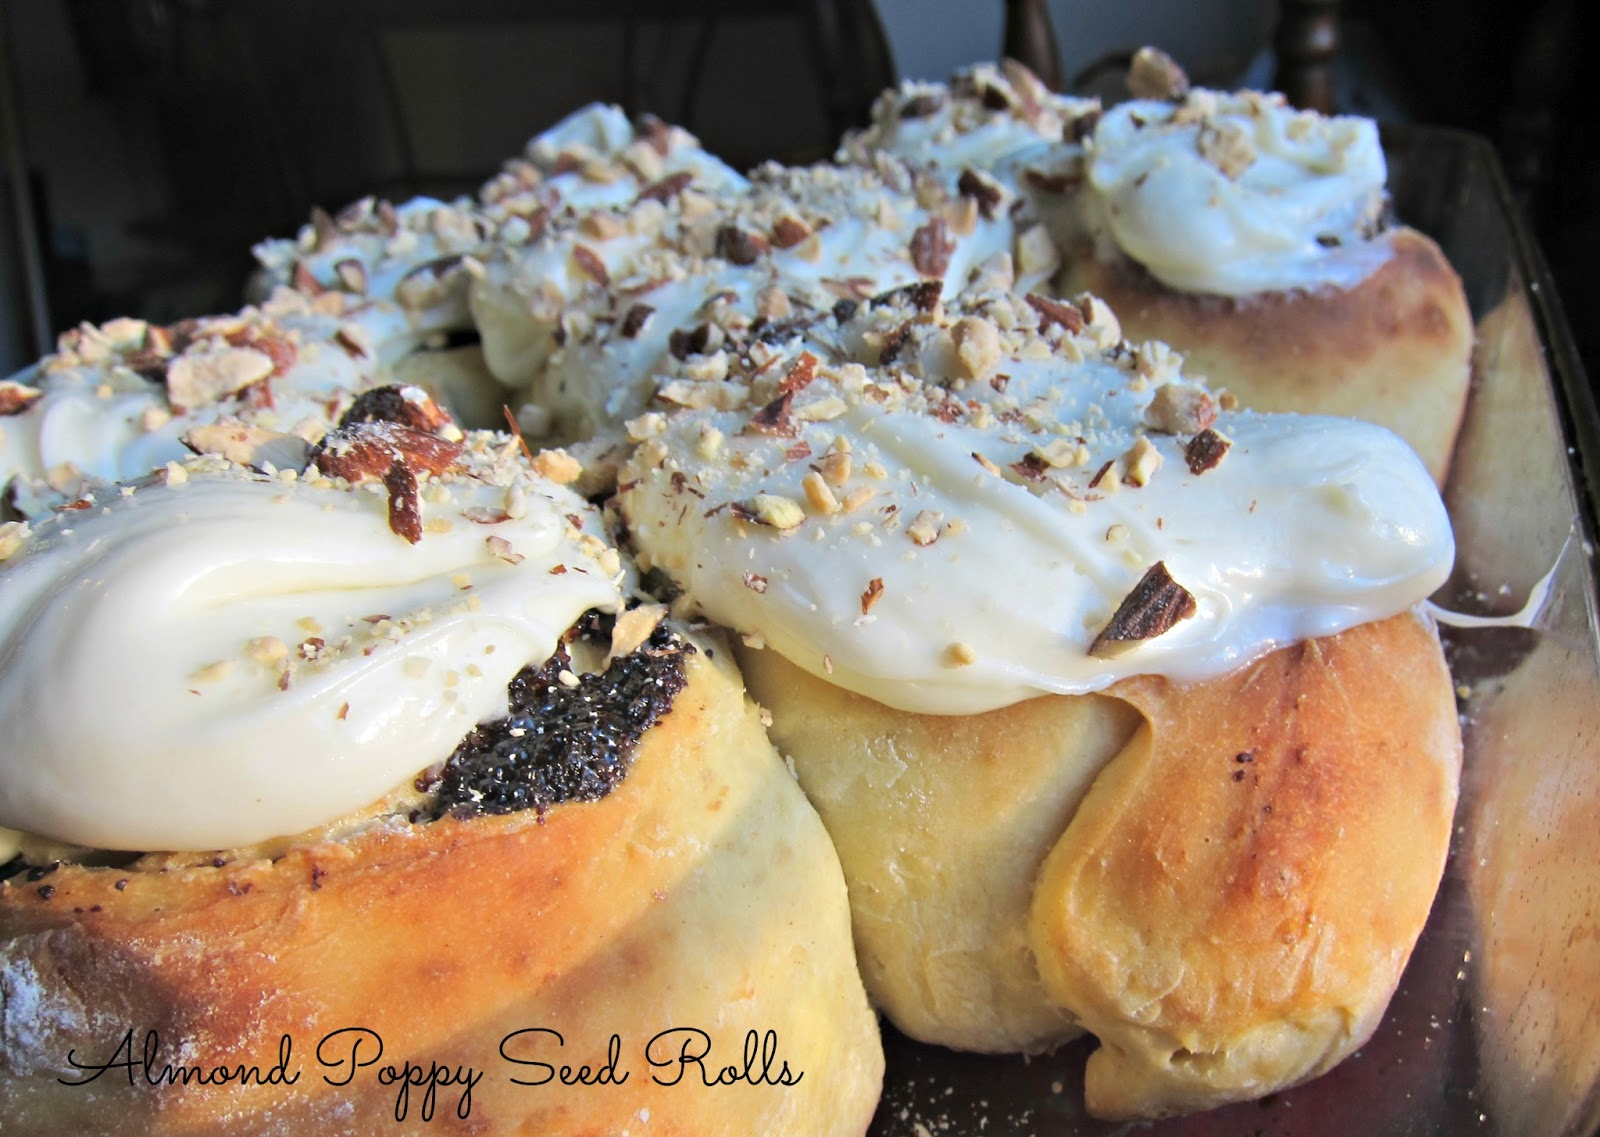 Almond Poppy Seed Cake Gluten Free